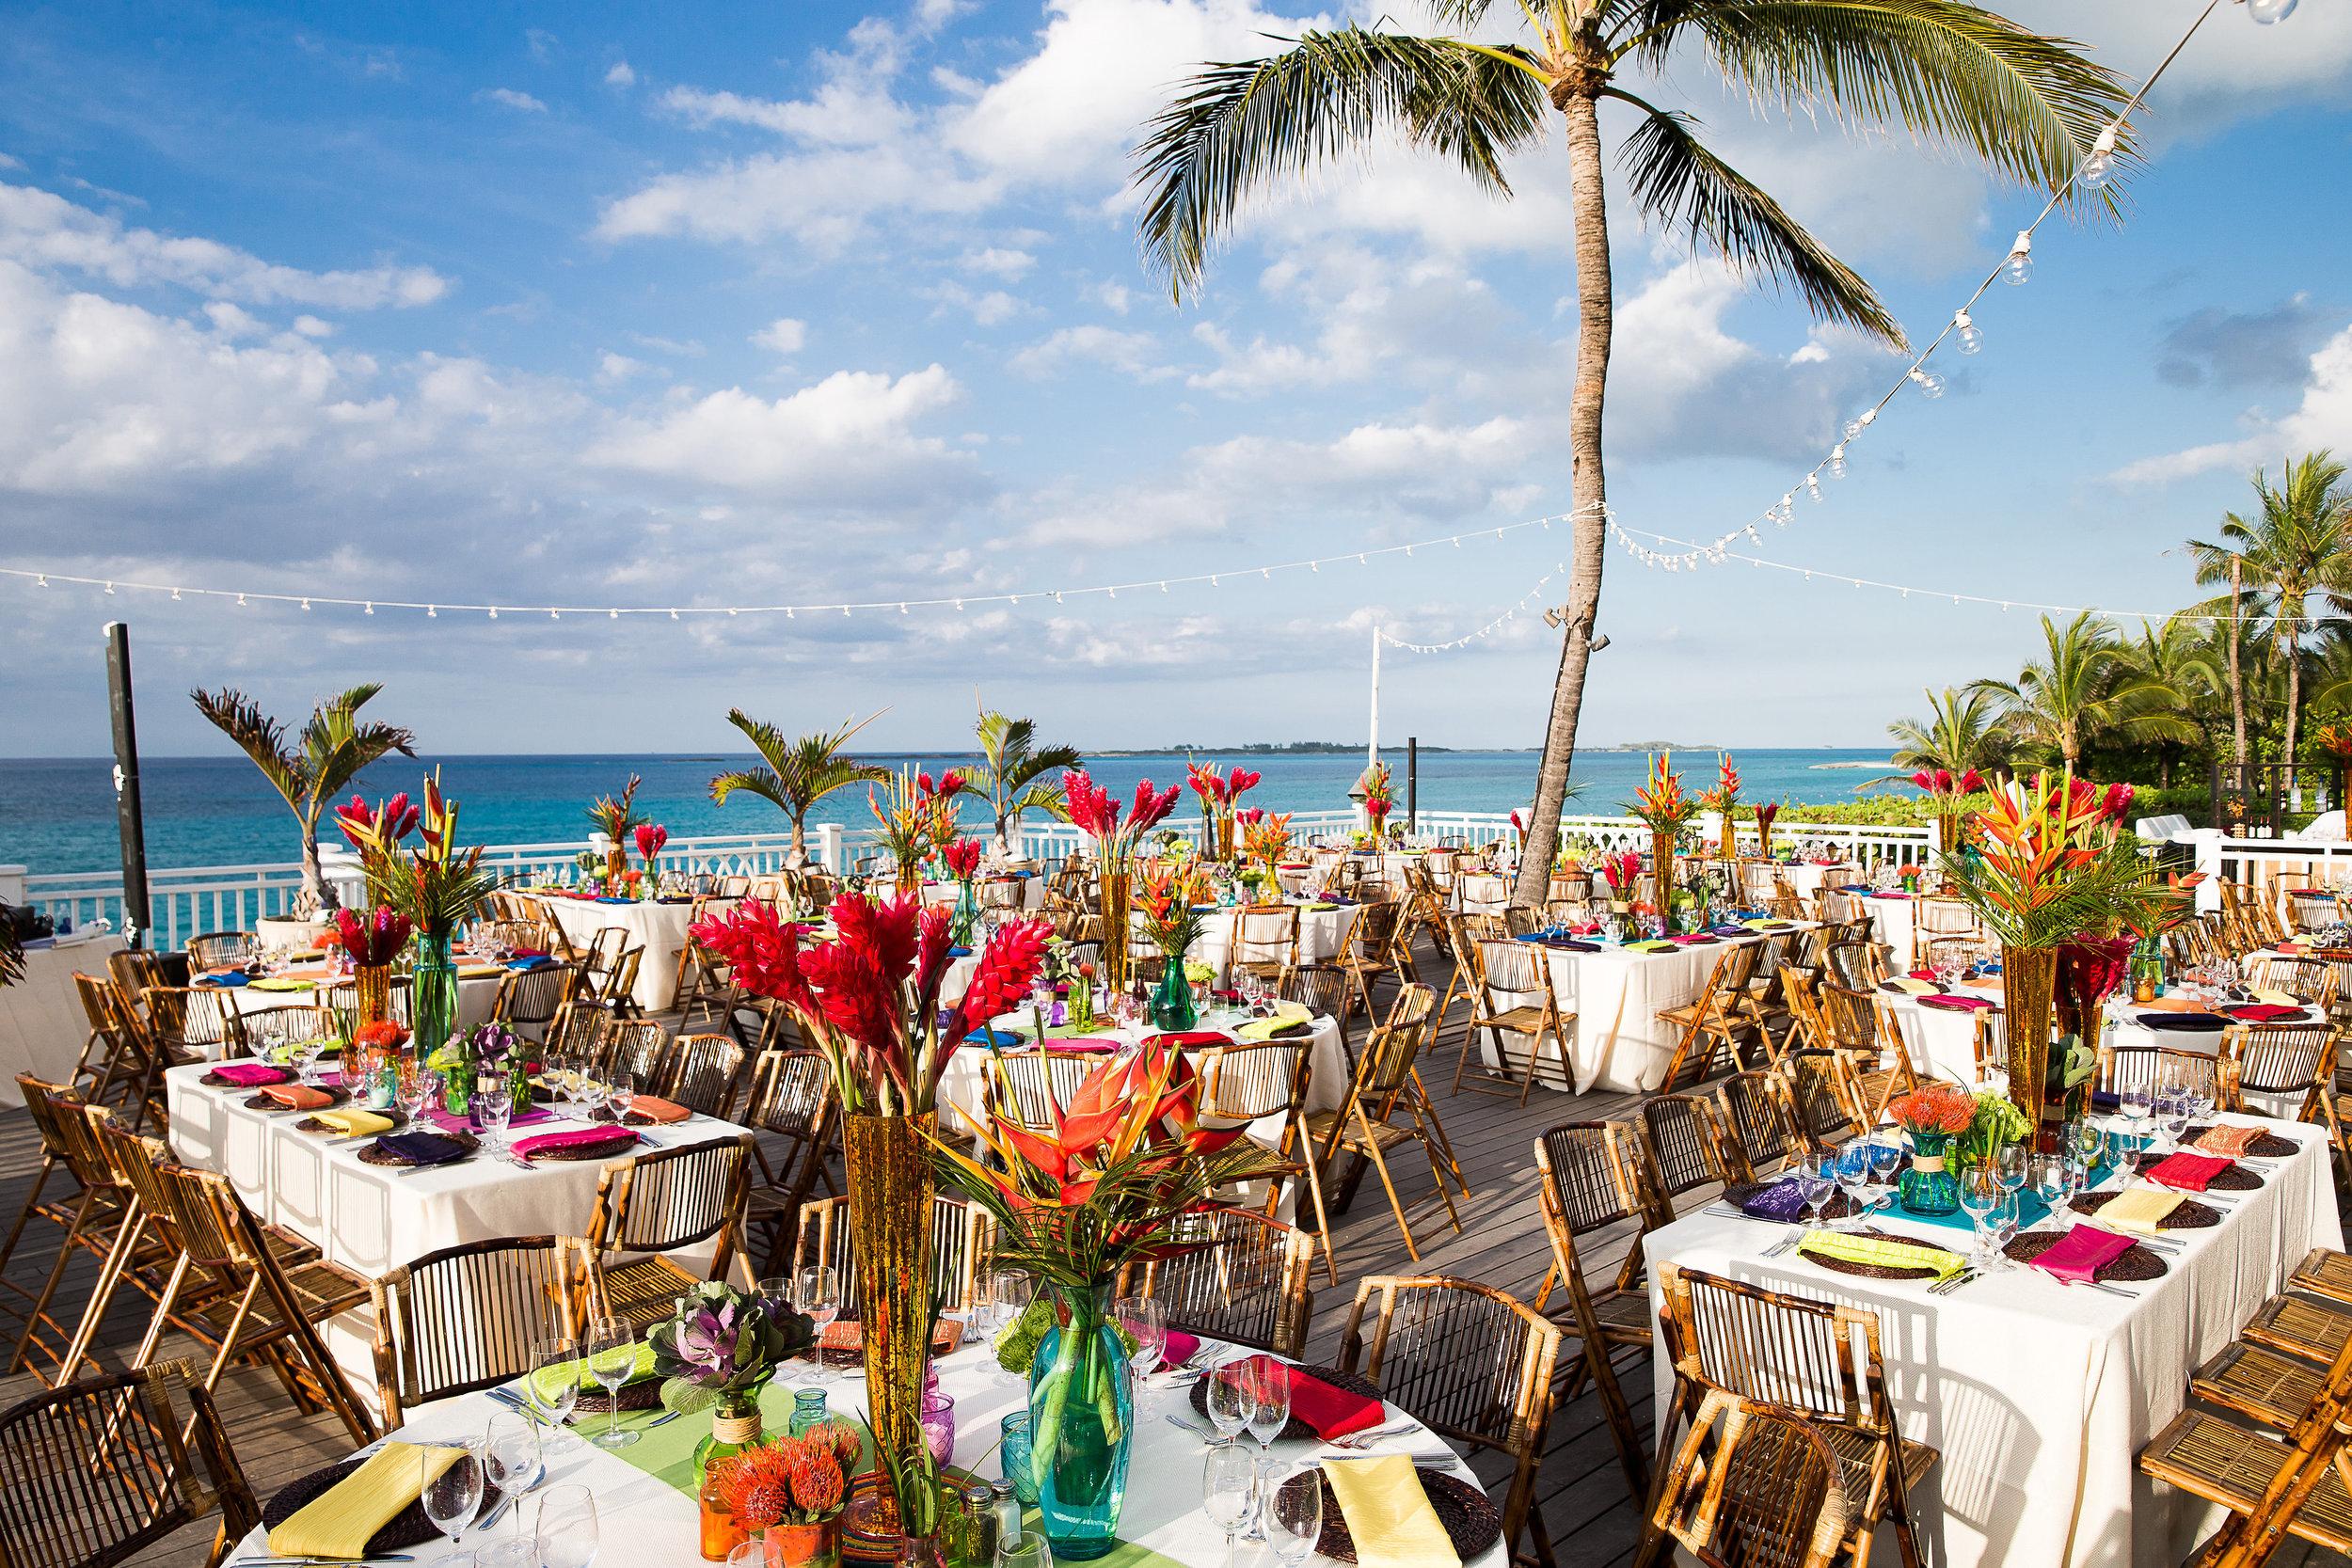 Ceci_New_York_Ceci_Style_Ceci_Johnson_Luxury_Lifestyle_Destination_Bahamas_Wedding_Letterpress_Inspiration_Design_Custom_Couture_Personalized_Invitations_21.jpg